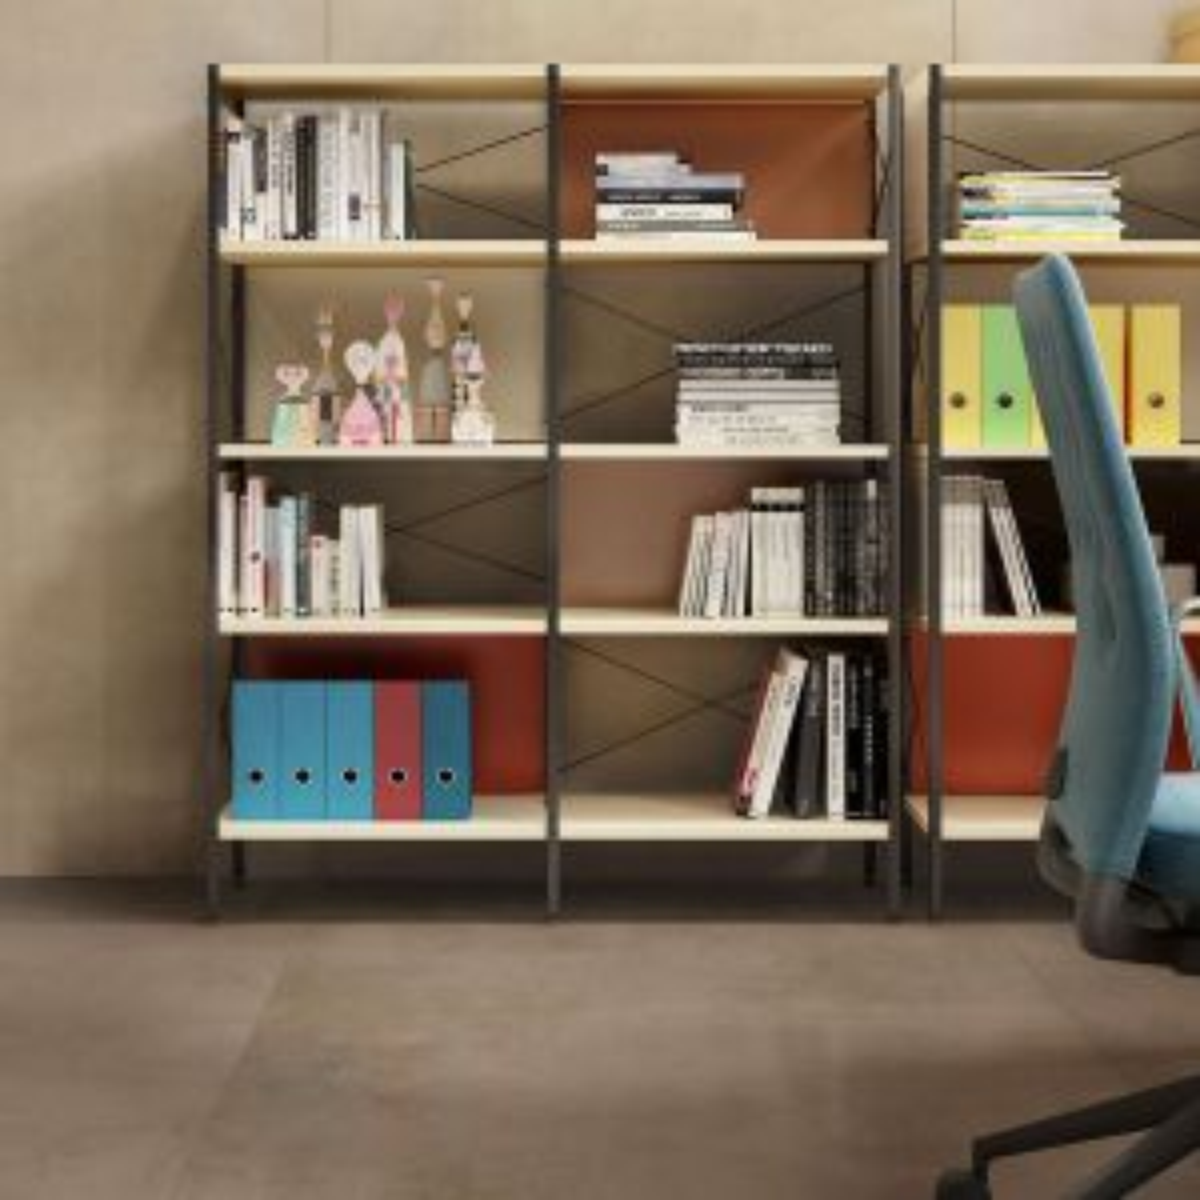 RAK Surface Greige Lappato Tile 600 x 1200mm Lifestyle